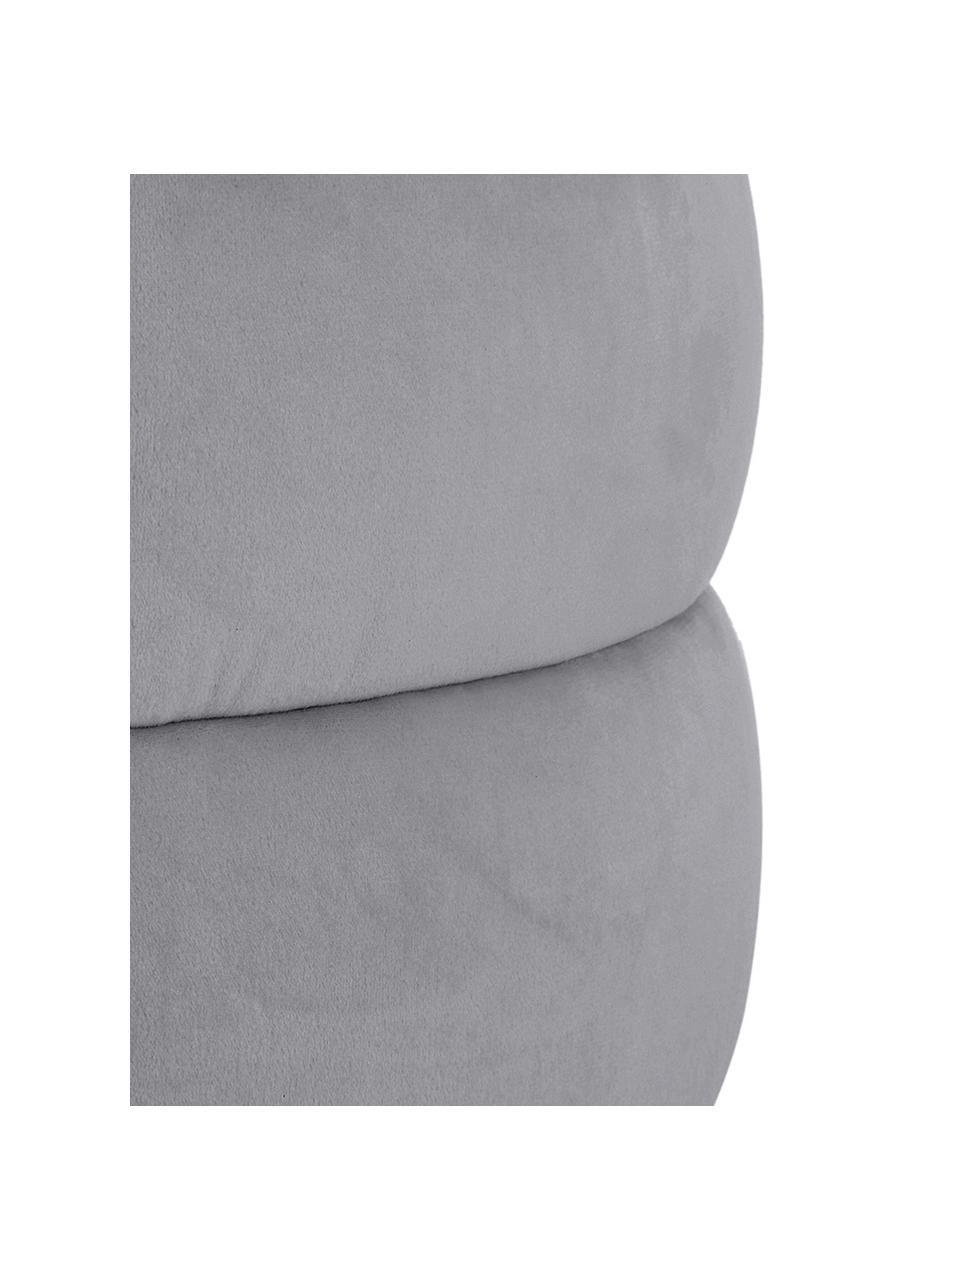 Samt-Hocker Alto in Grau, Bezug: Samt (100% Polyester) Der, Gestell: Massives Kiefernholz, Spe, Samt Grau, Ø 42 x H 47 cm